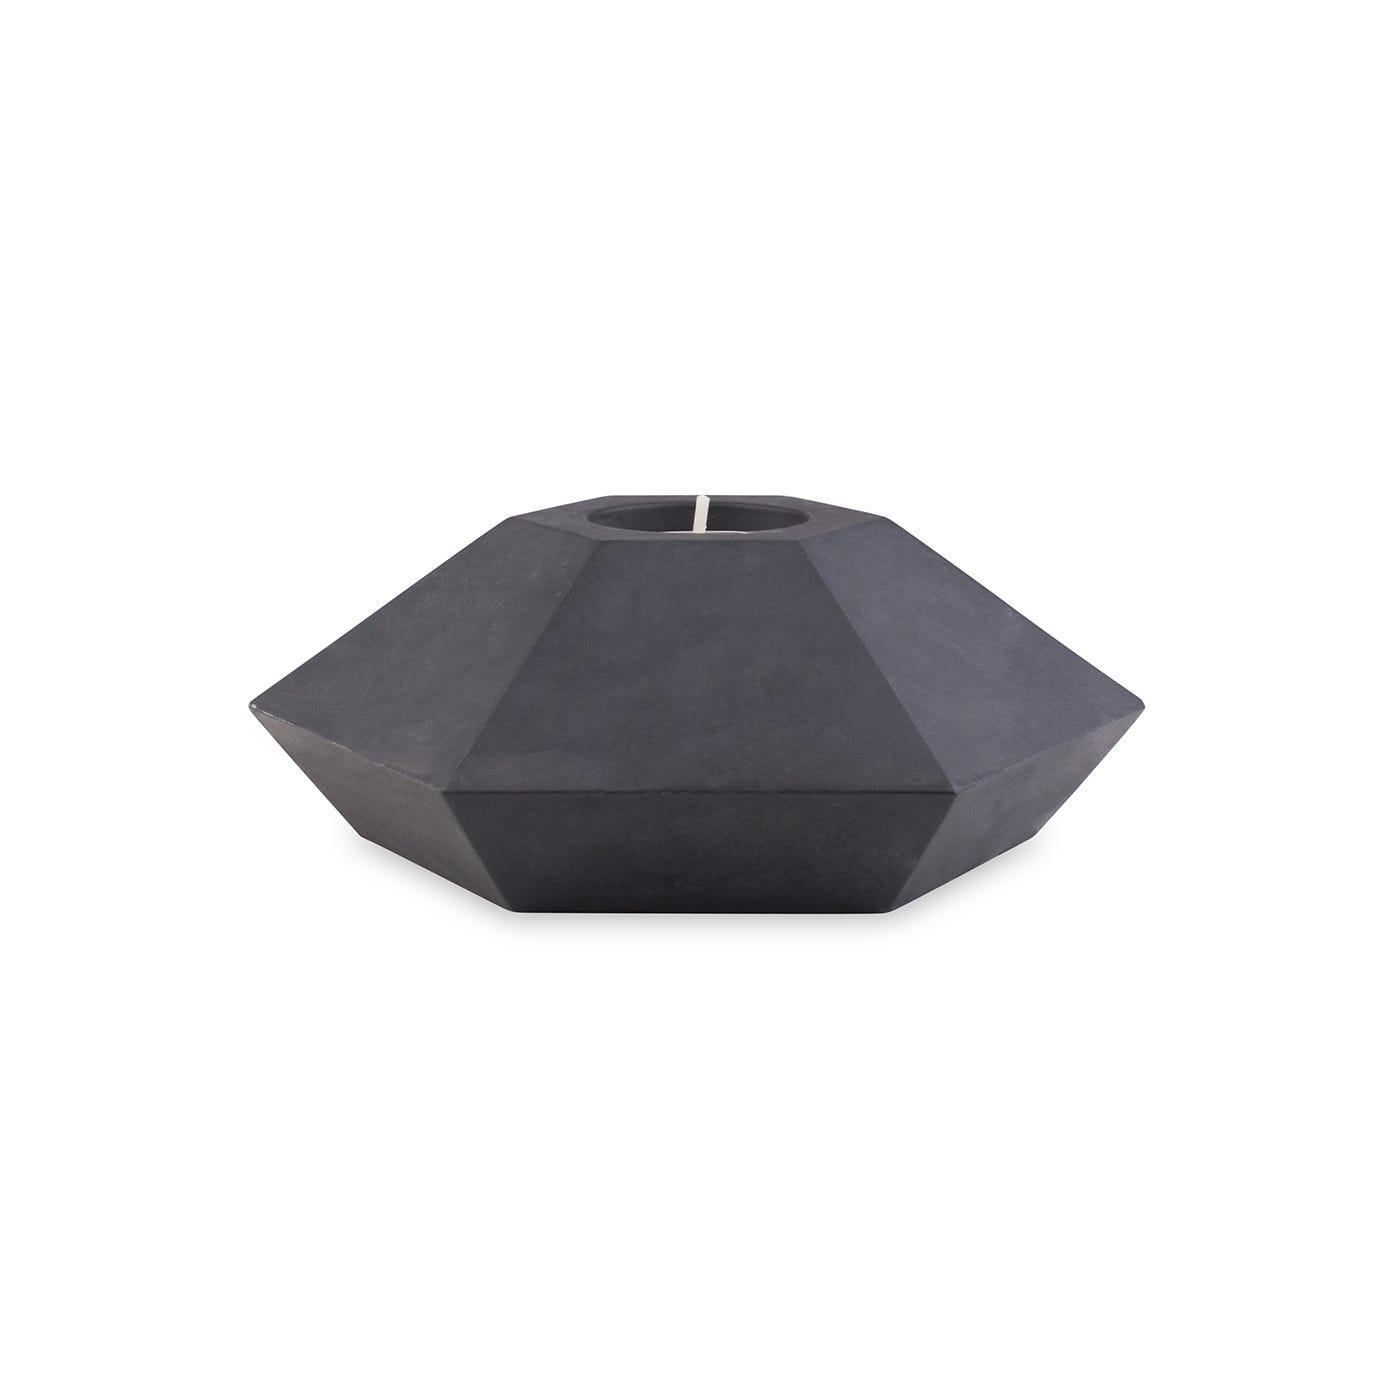 Concrete Tealight Holder in Black